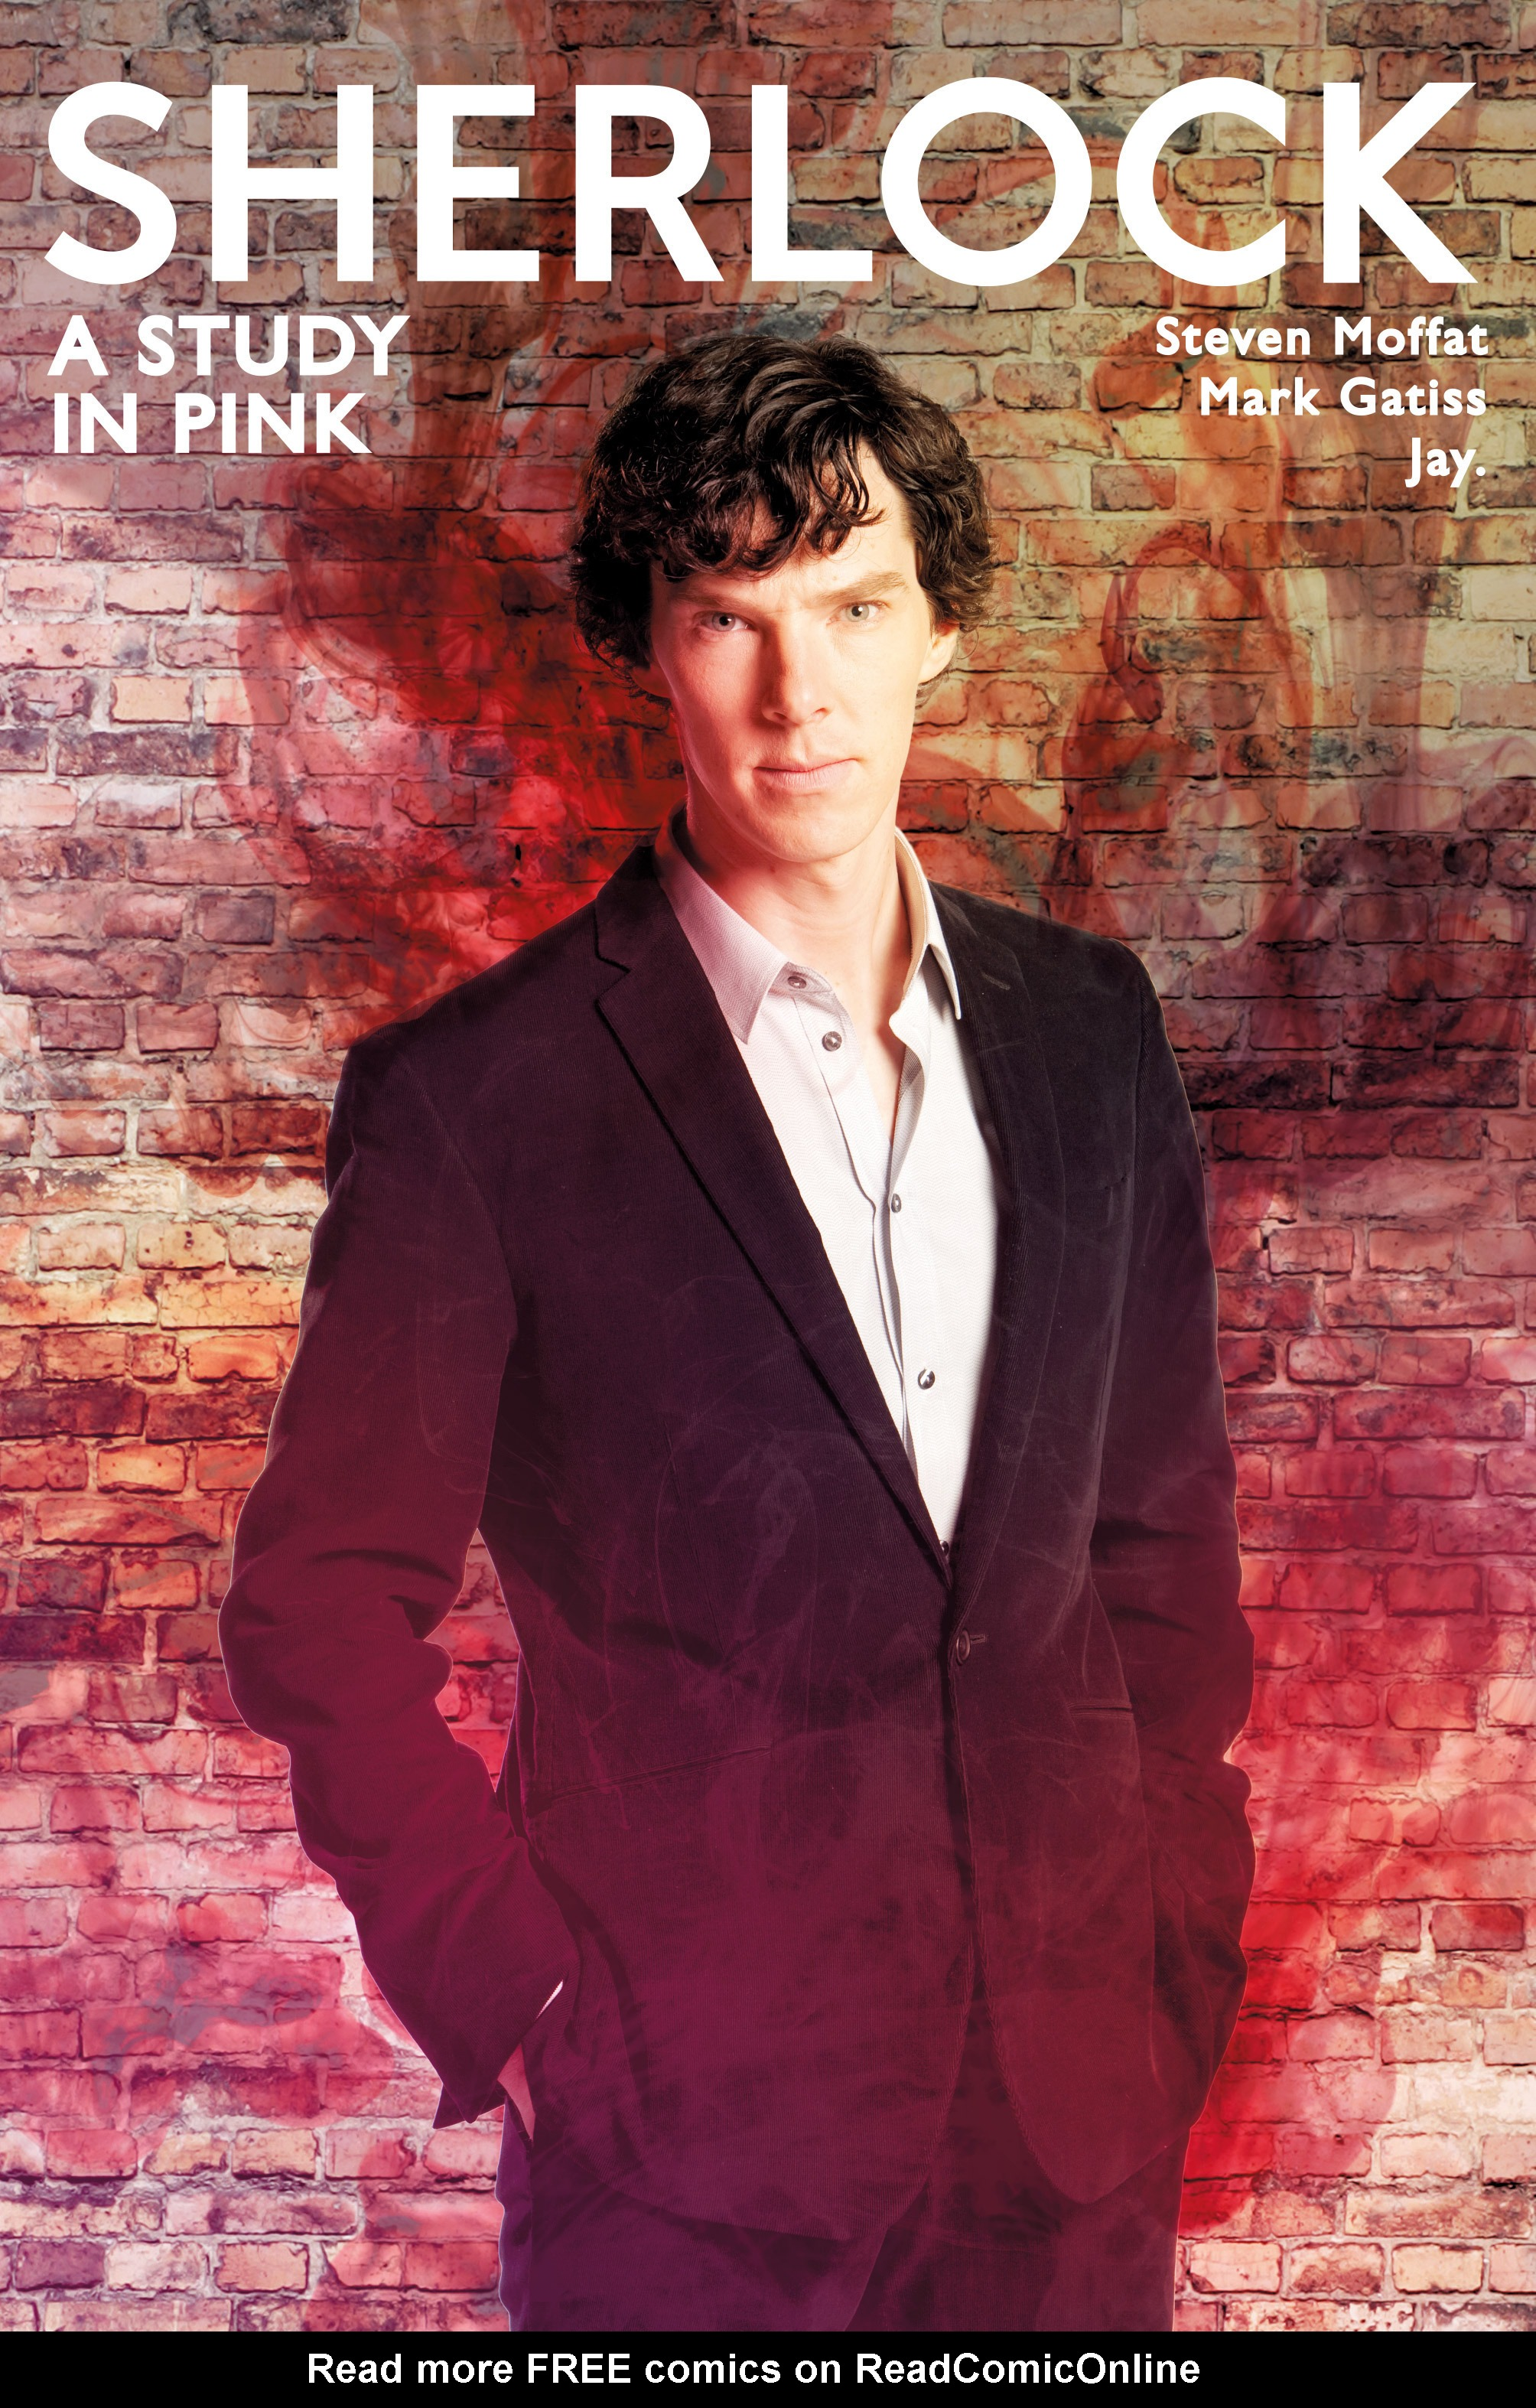 Read online Sherlock: A Study In Pink comic -  Issue #5 - 2